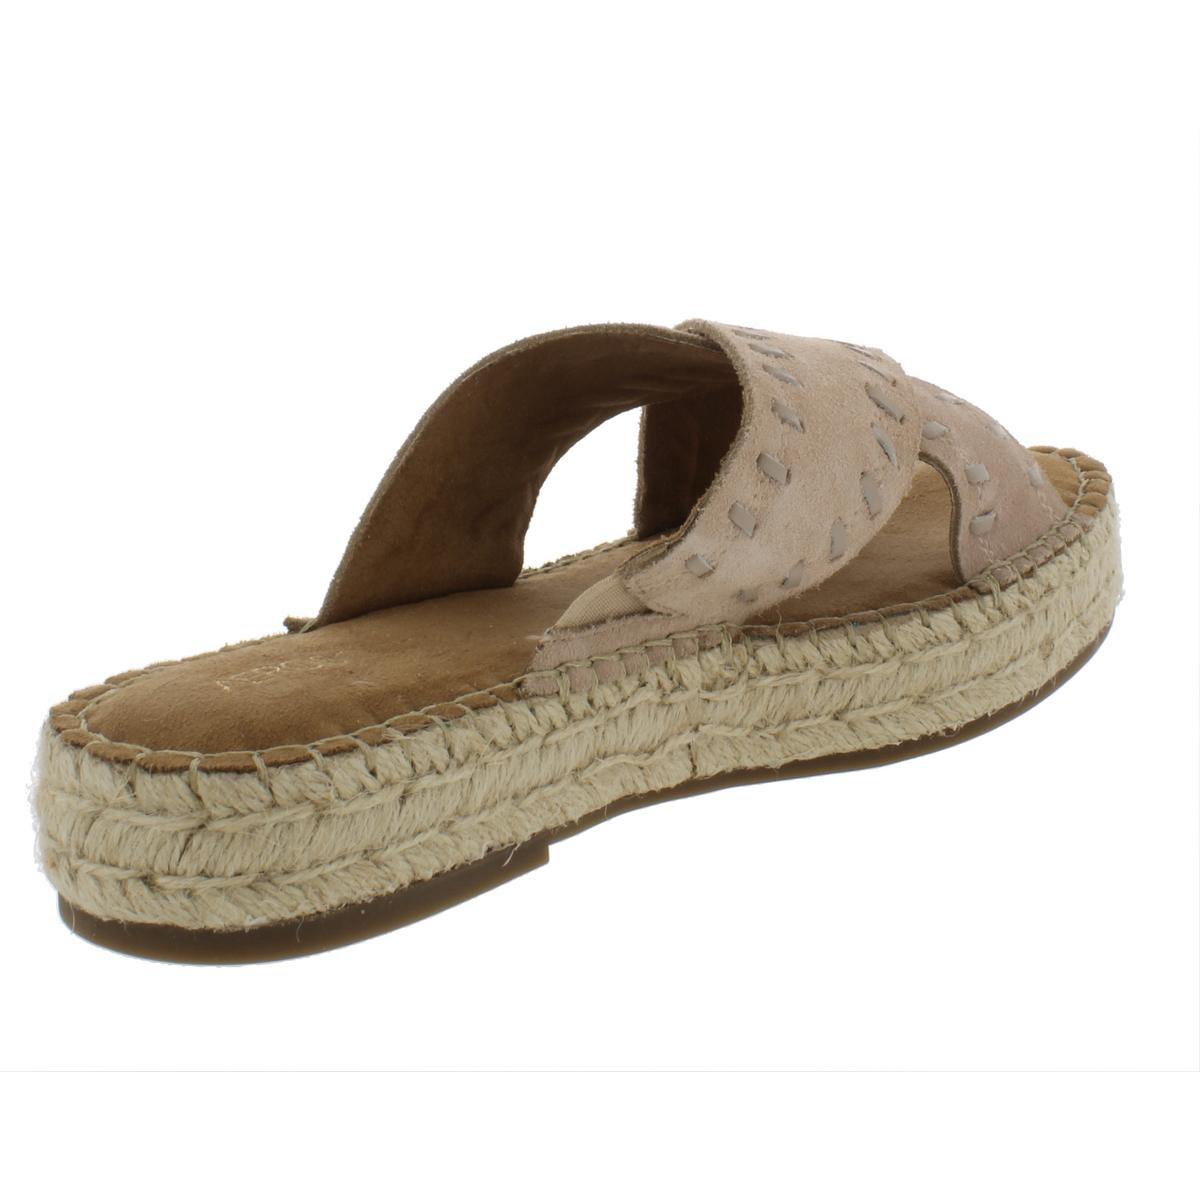 8632996b8a5 Aerosoles Womens Rose Gold Flatform Sandals Leisure Espadrilles ...